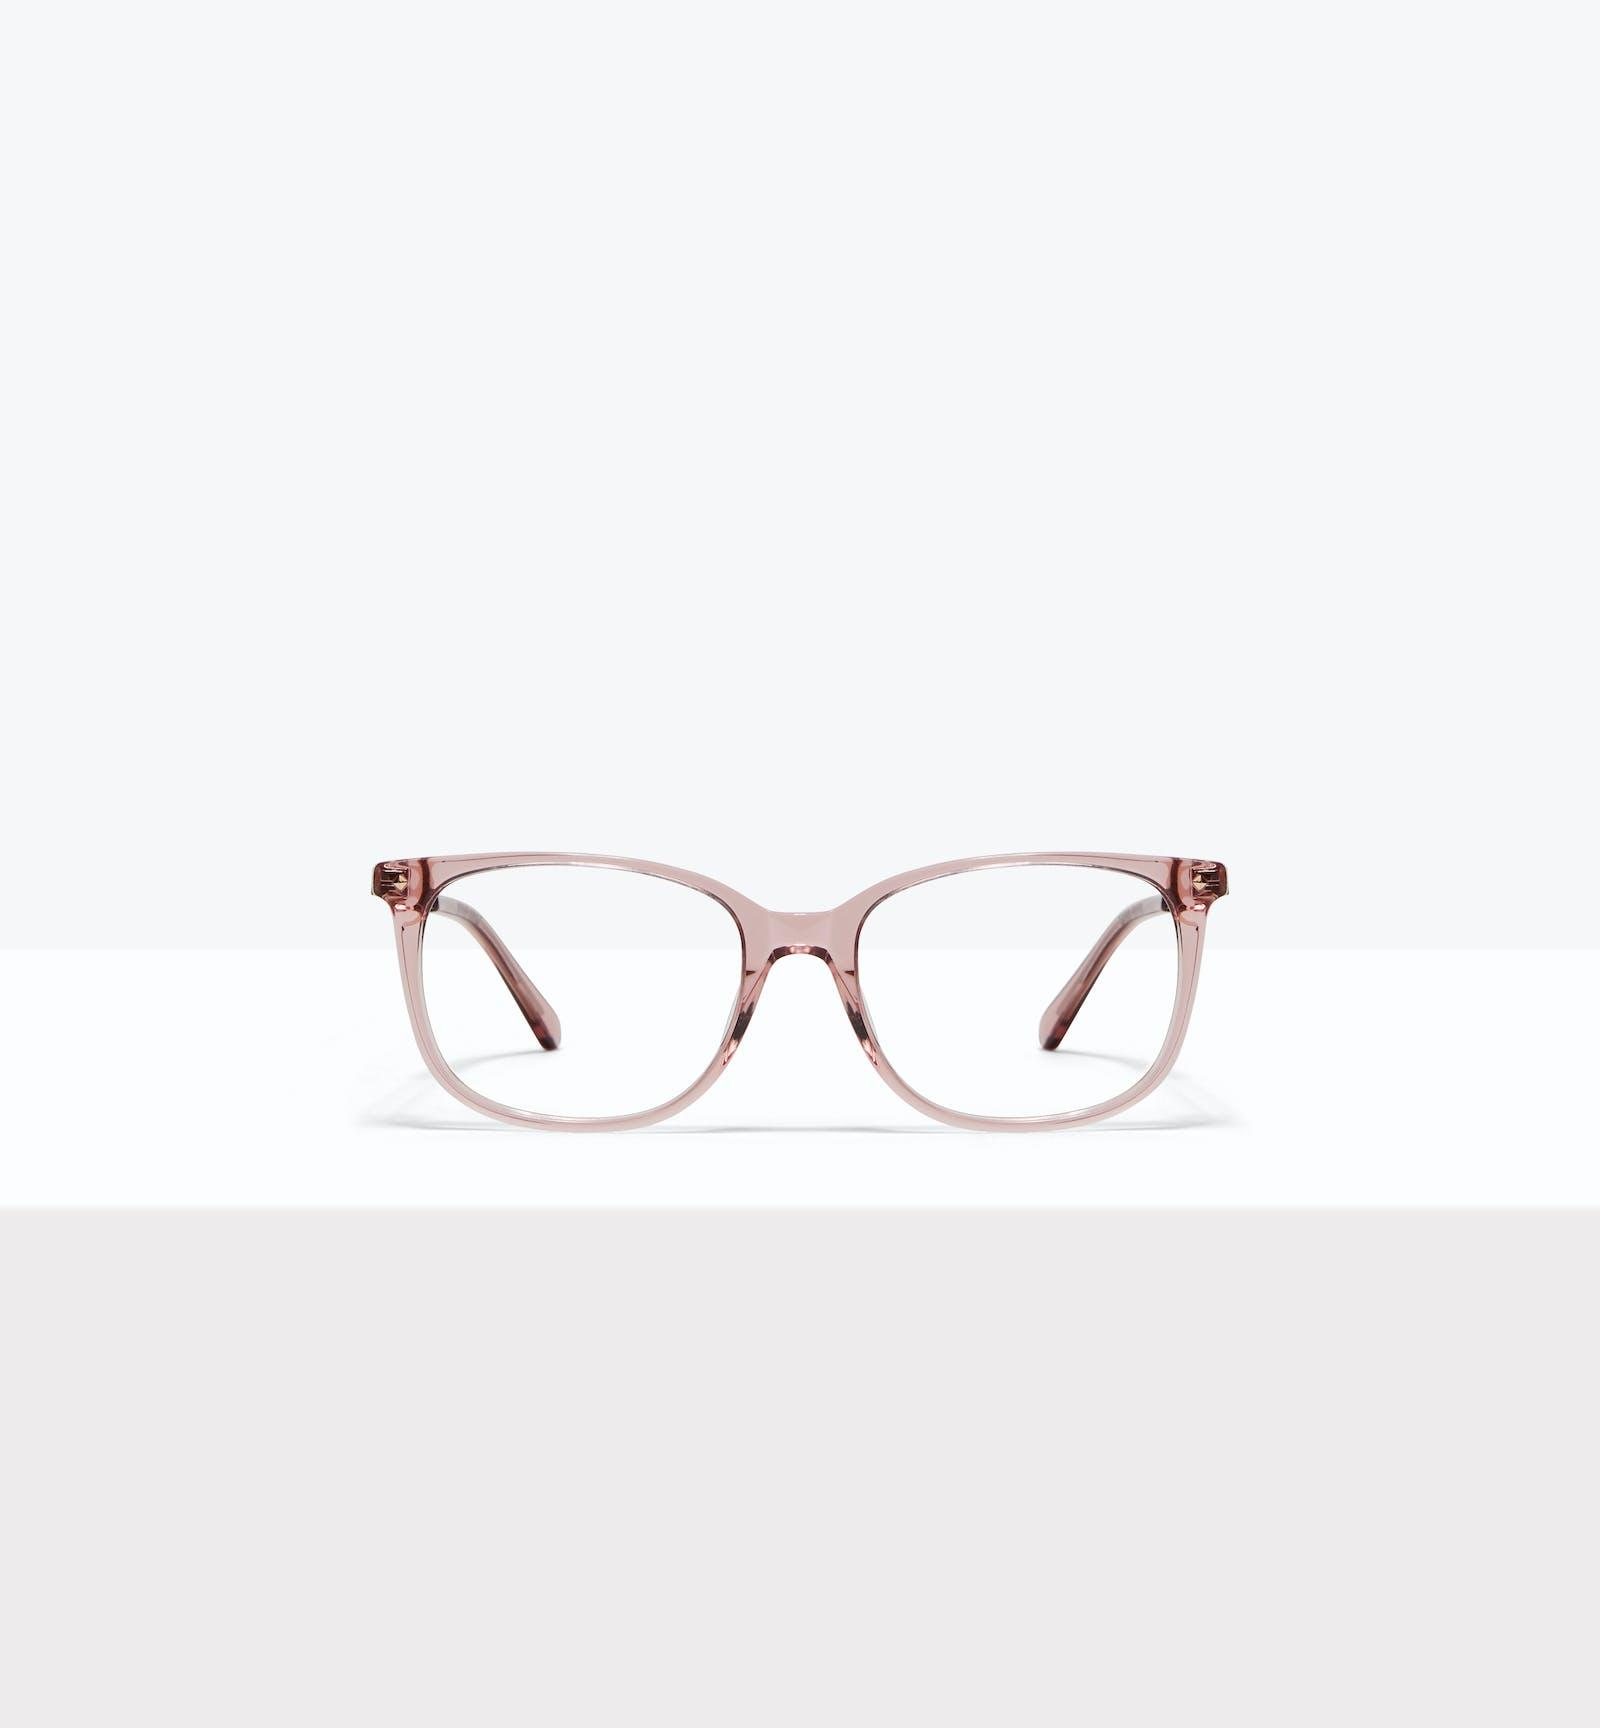 7ac0f34a396302 Affordable Fashion Glasses Rectangle Square Eyeglasses Women Refine Rose